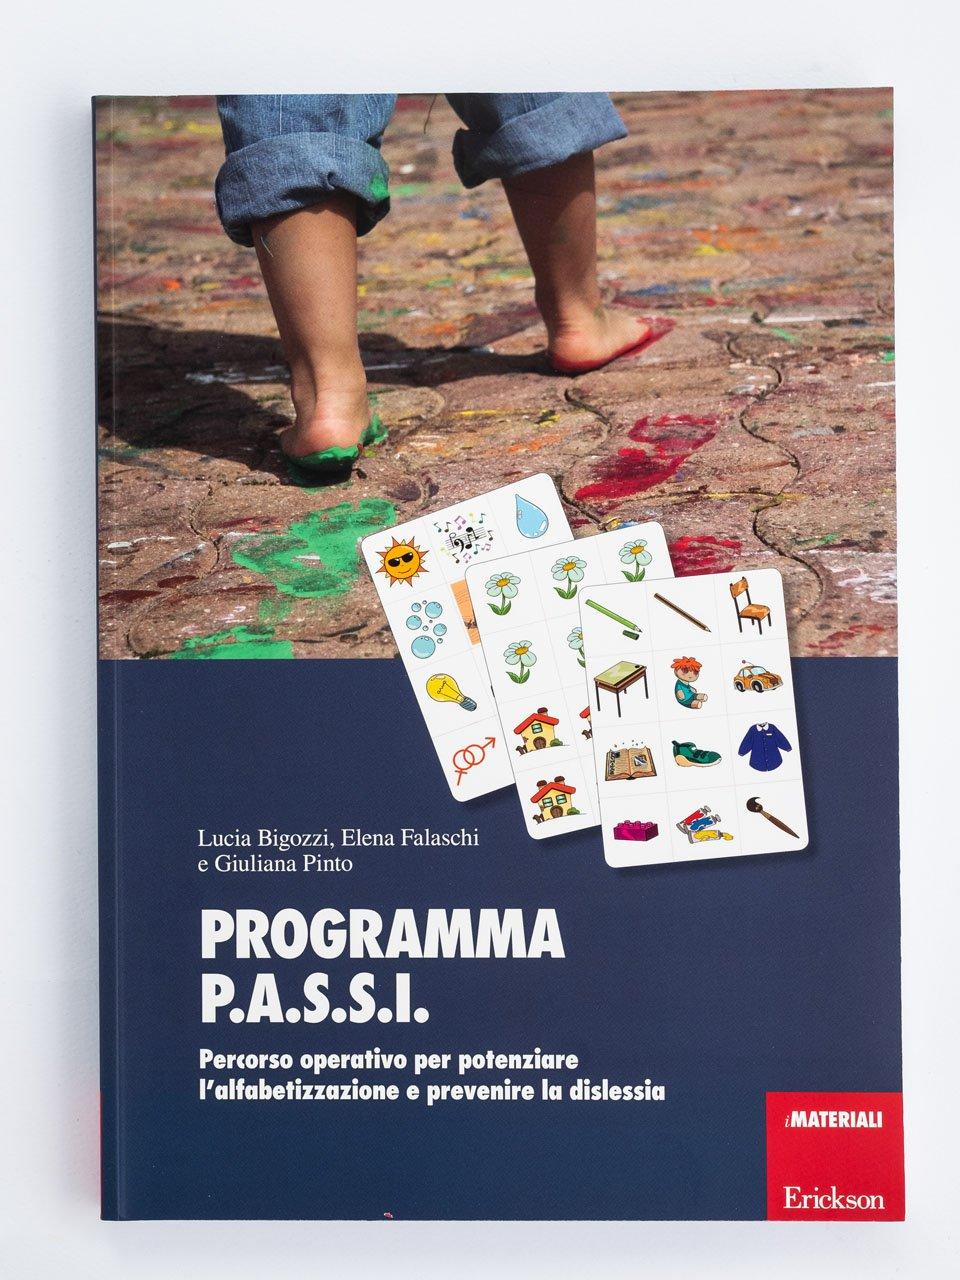 Programma P.A.S.S.I. - L'incantesimo di Rocco - App e software - Erickson